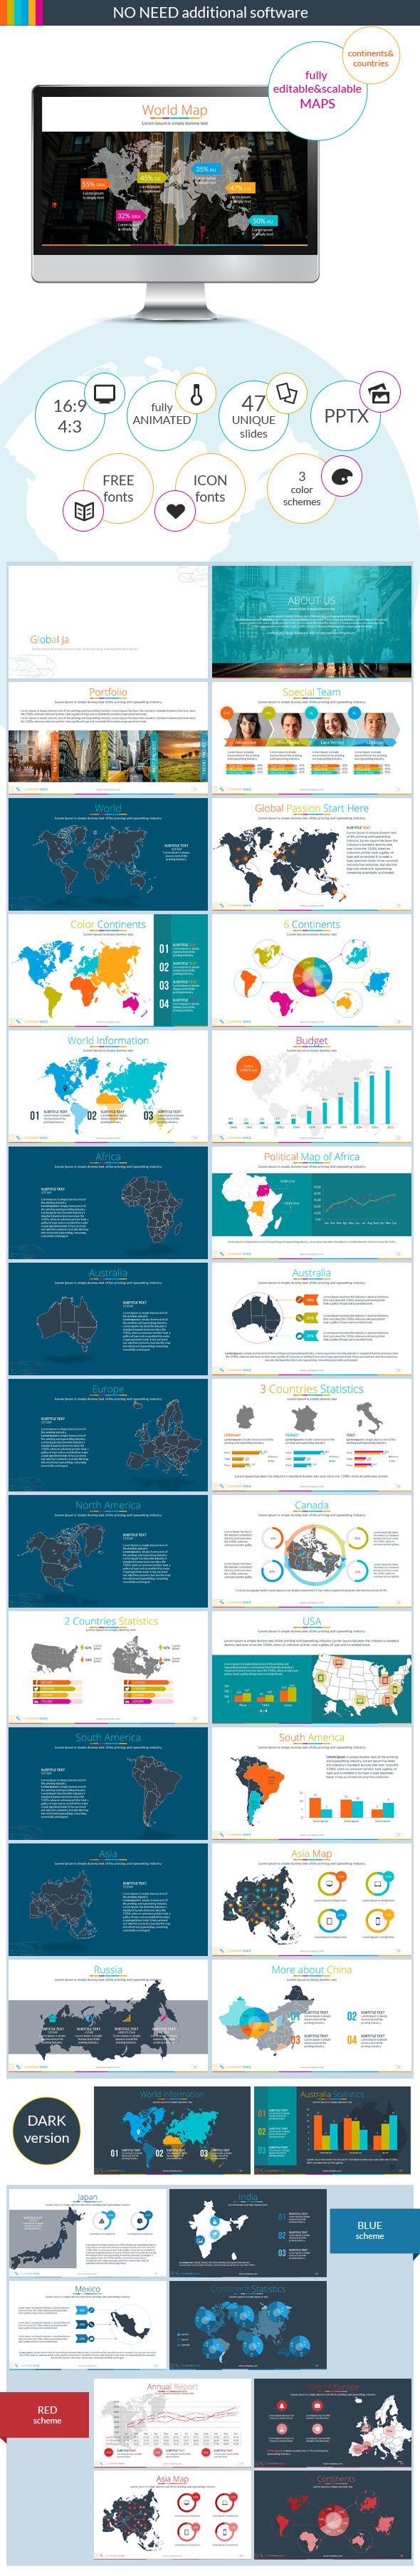 ContinentsuCountries PowerPoint Presentation Powerpoint